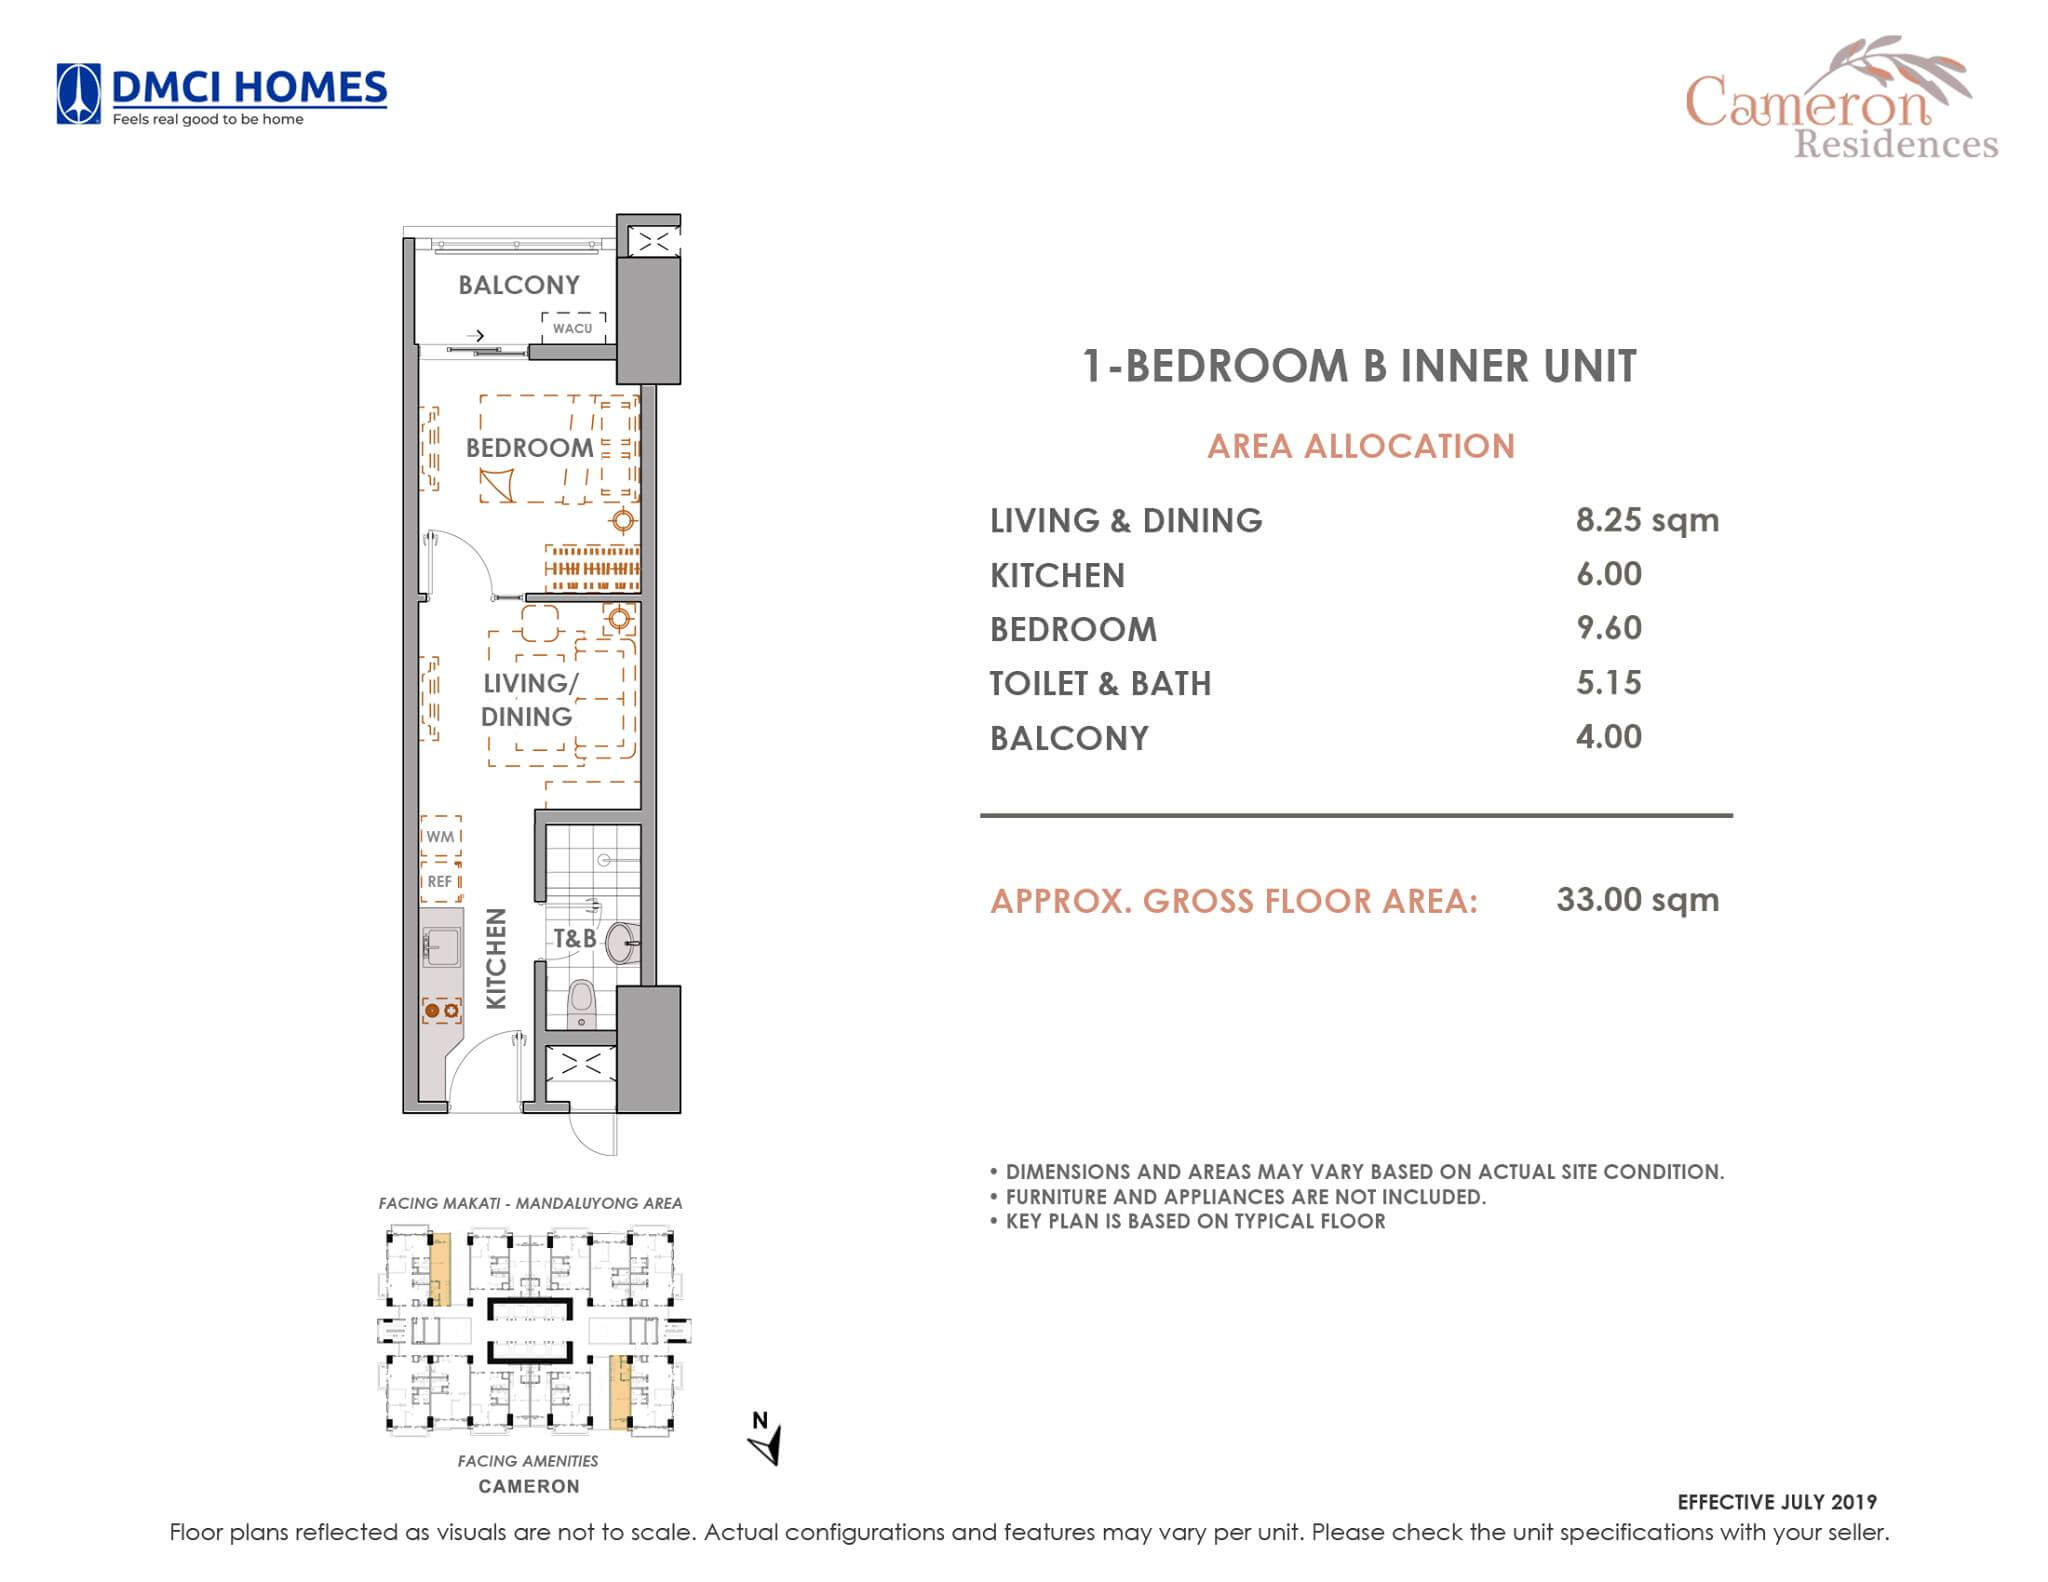 Cameron DMCI 1 Bedroom B Unit Layout